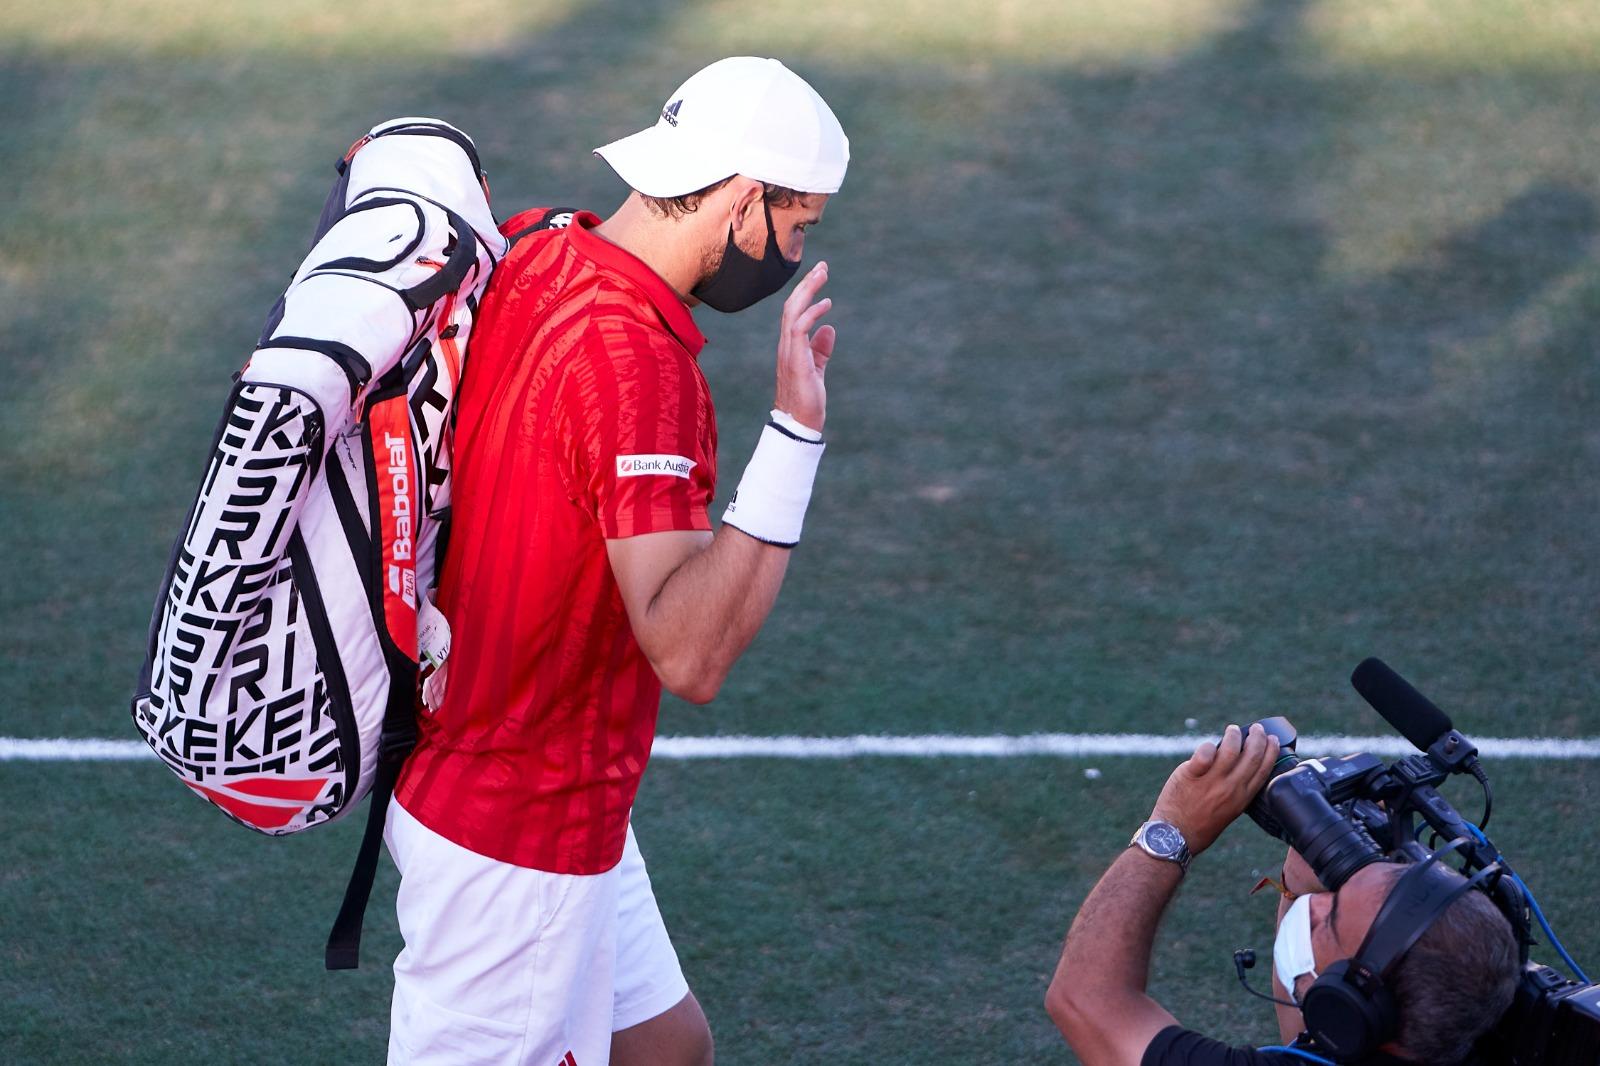 E4gS5BrXIAESLZx - Thiem zaradi poškodbe izpušča Wimbledon